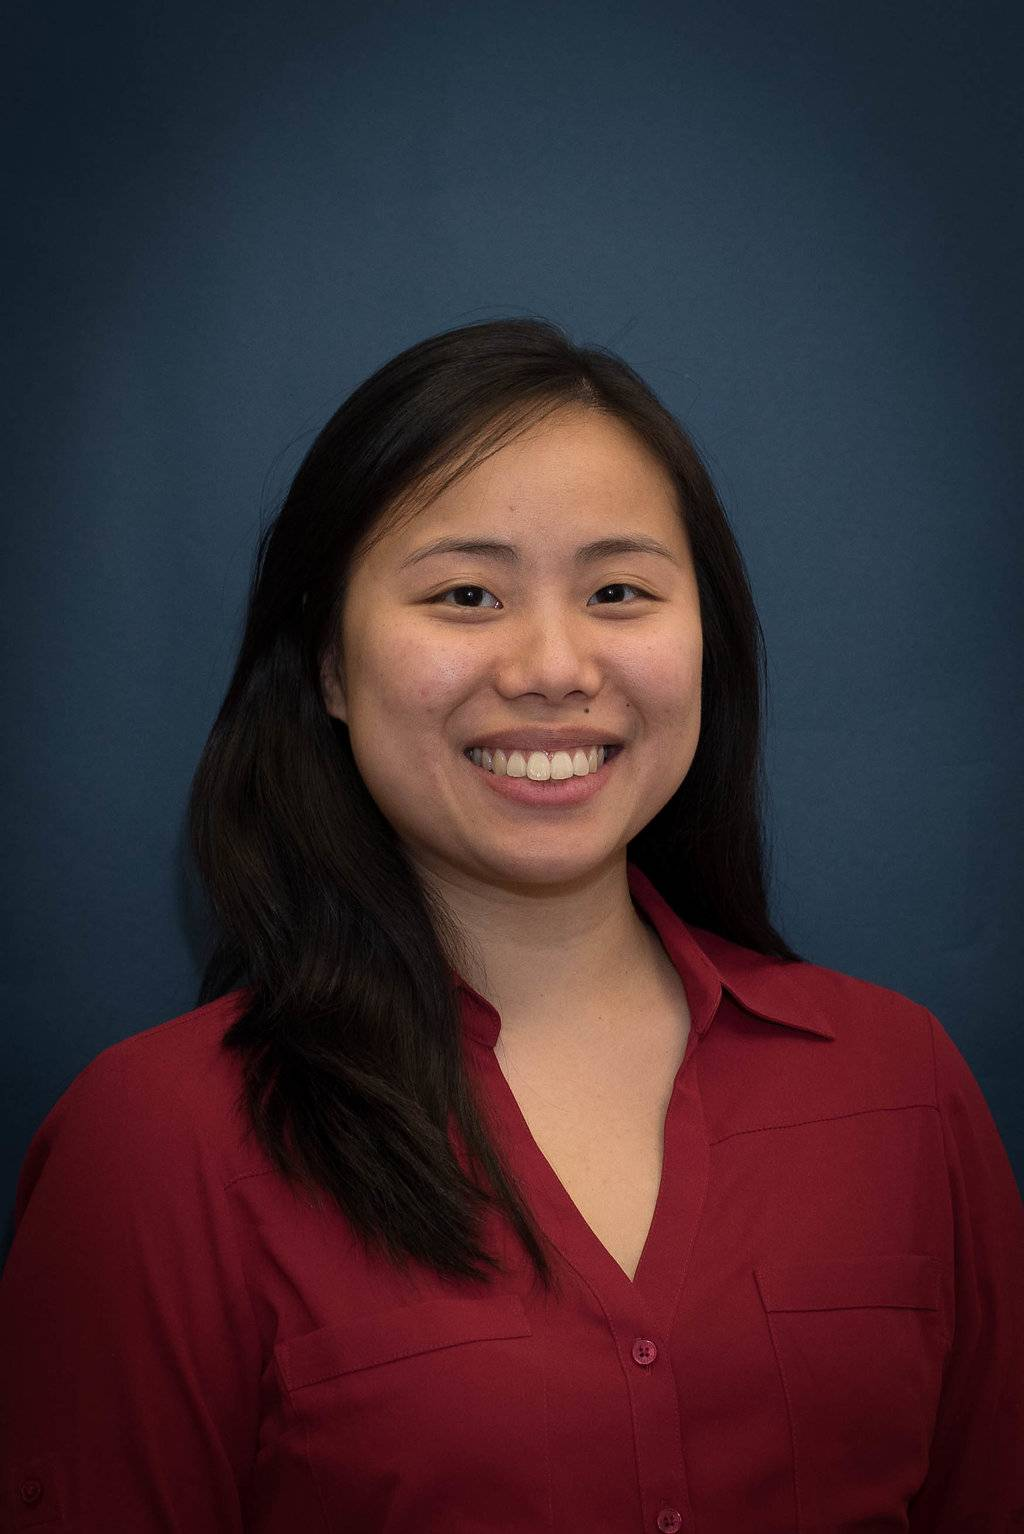 Dr.-Stefanie-Hwang